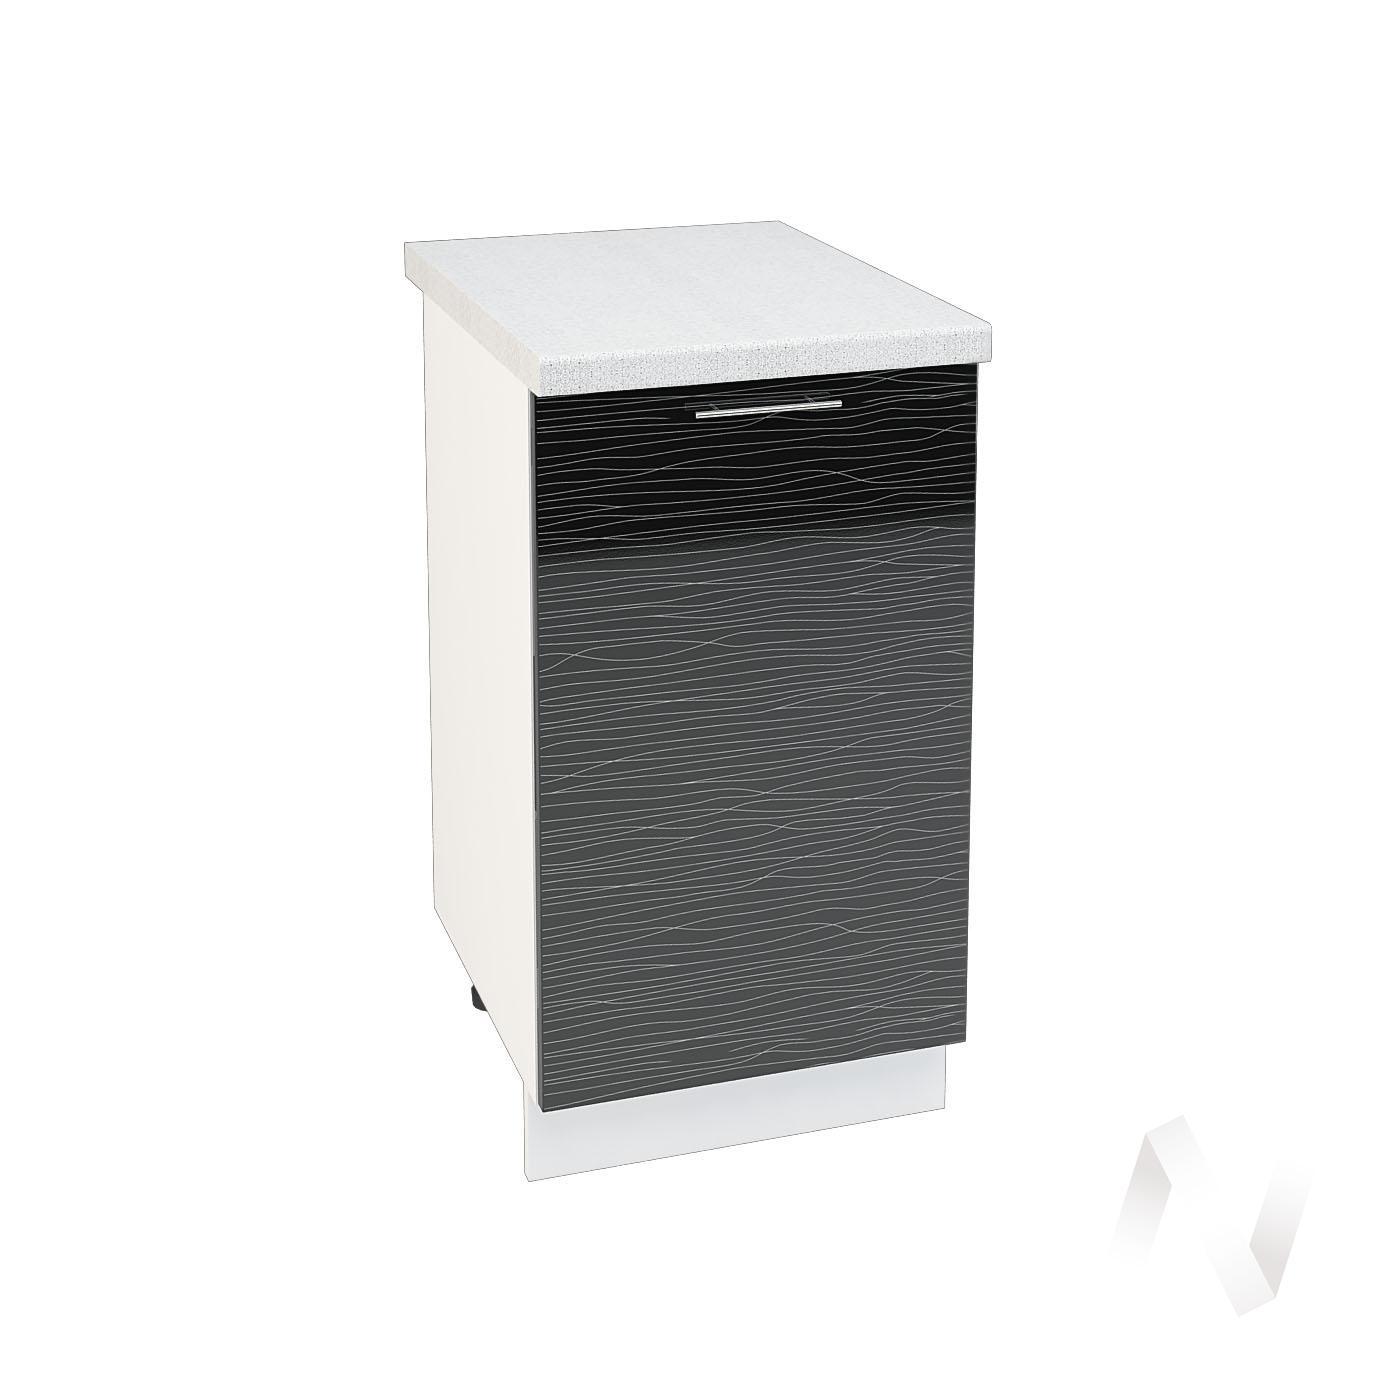 "Кухня ""Валерия-М"": Шкаф нижний 450, ШН 450 (Страйп черный/корпус белый)"